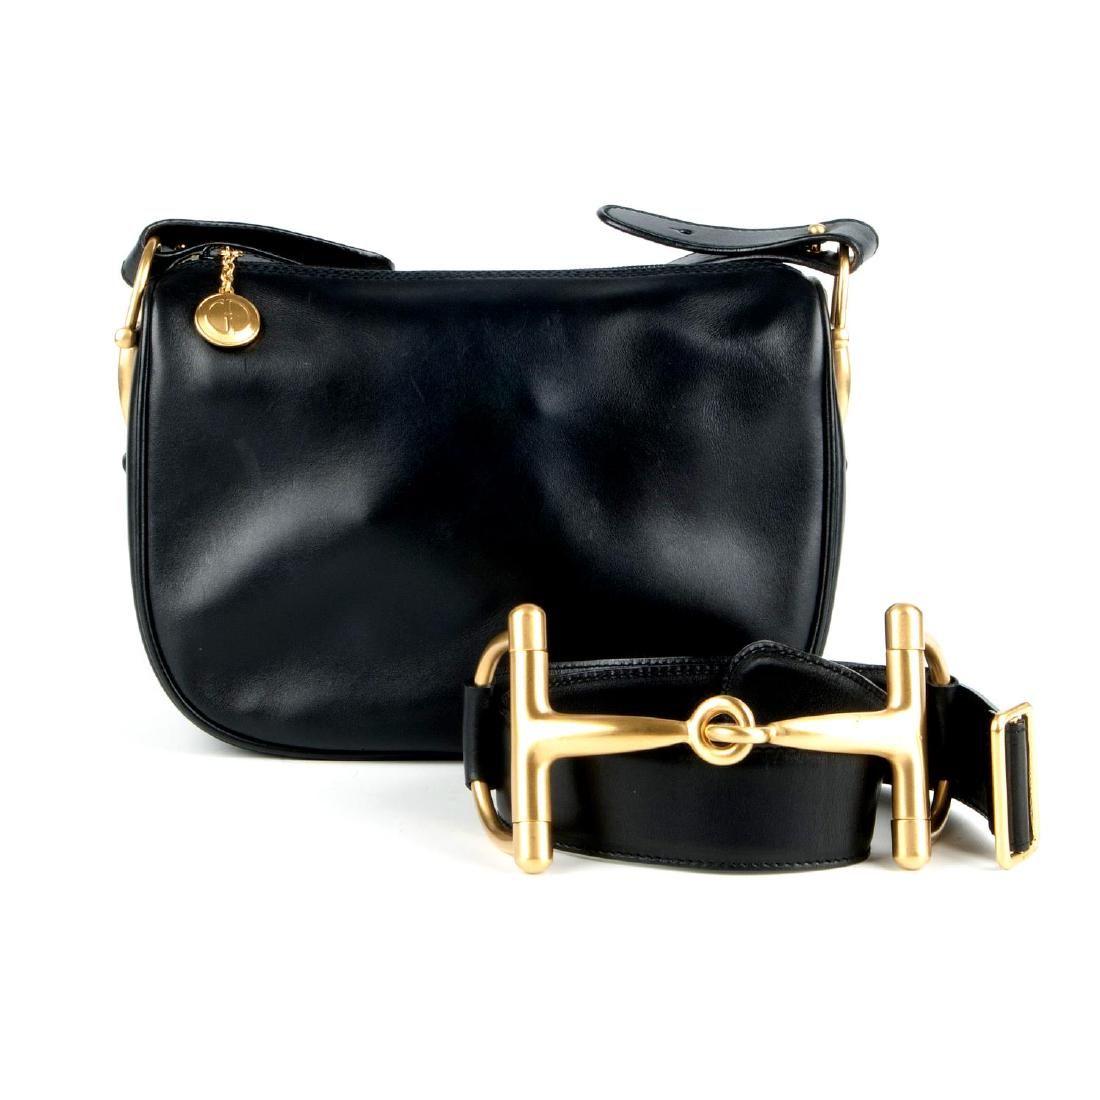 GUCCI - a black horsebit bag with matching belt.